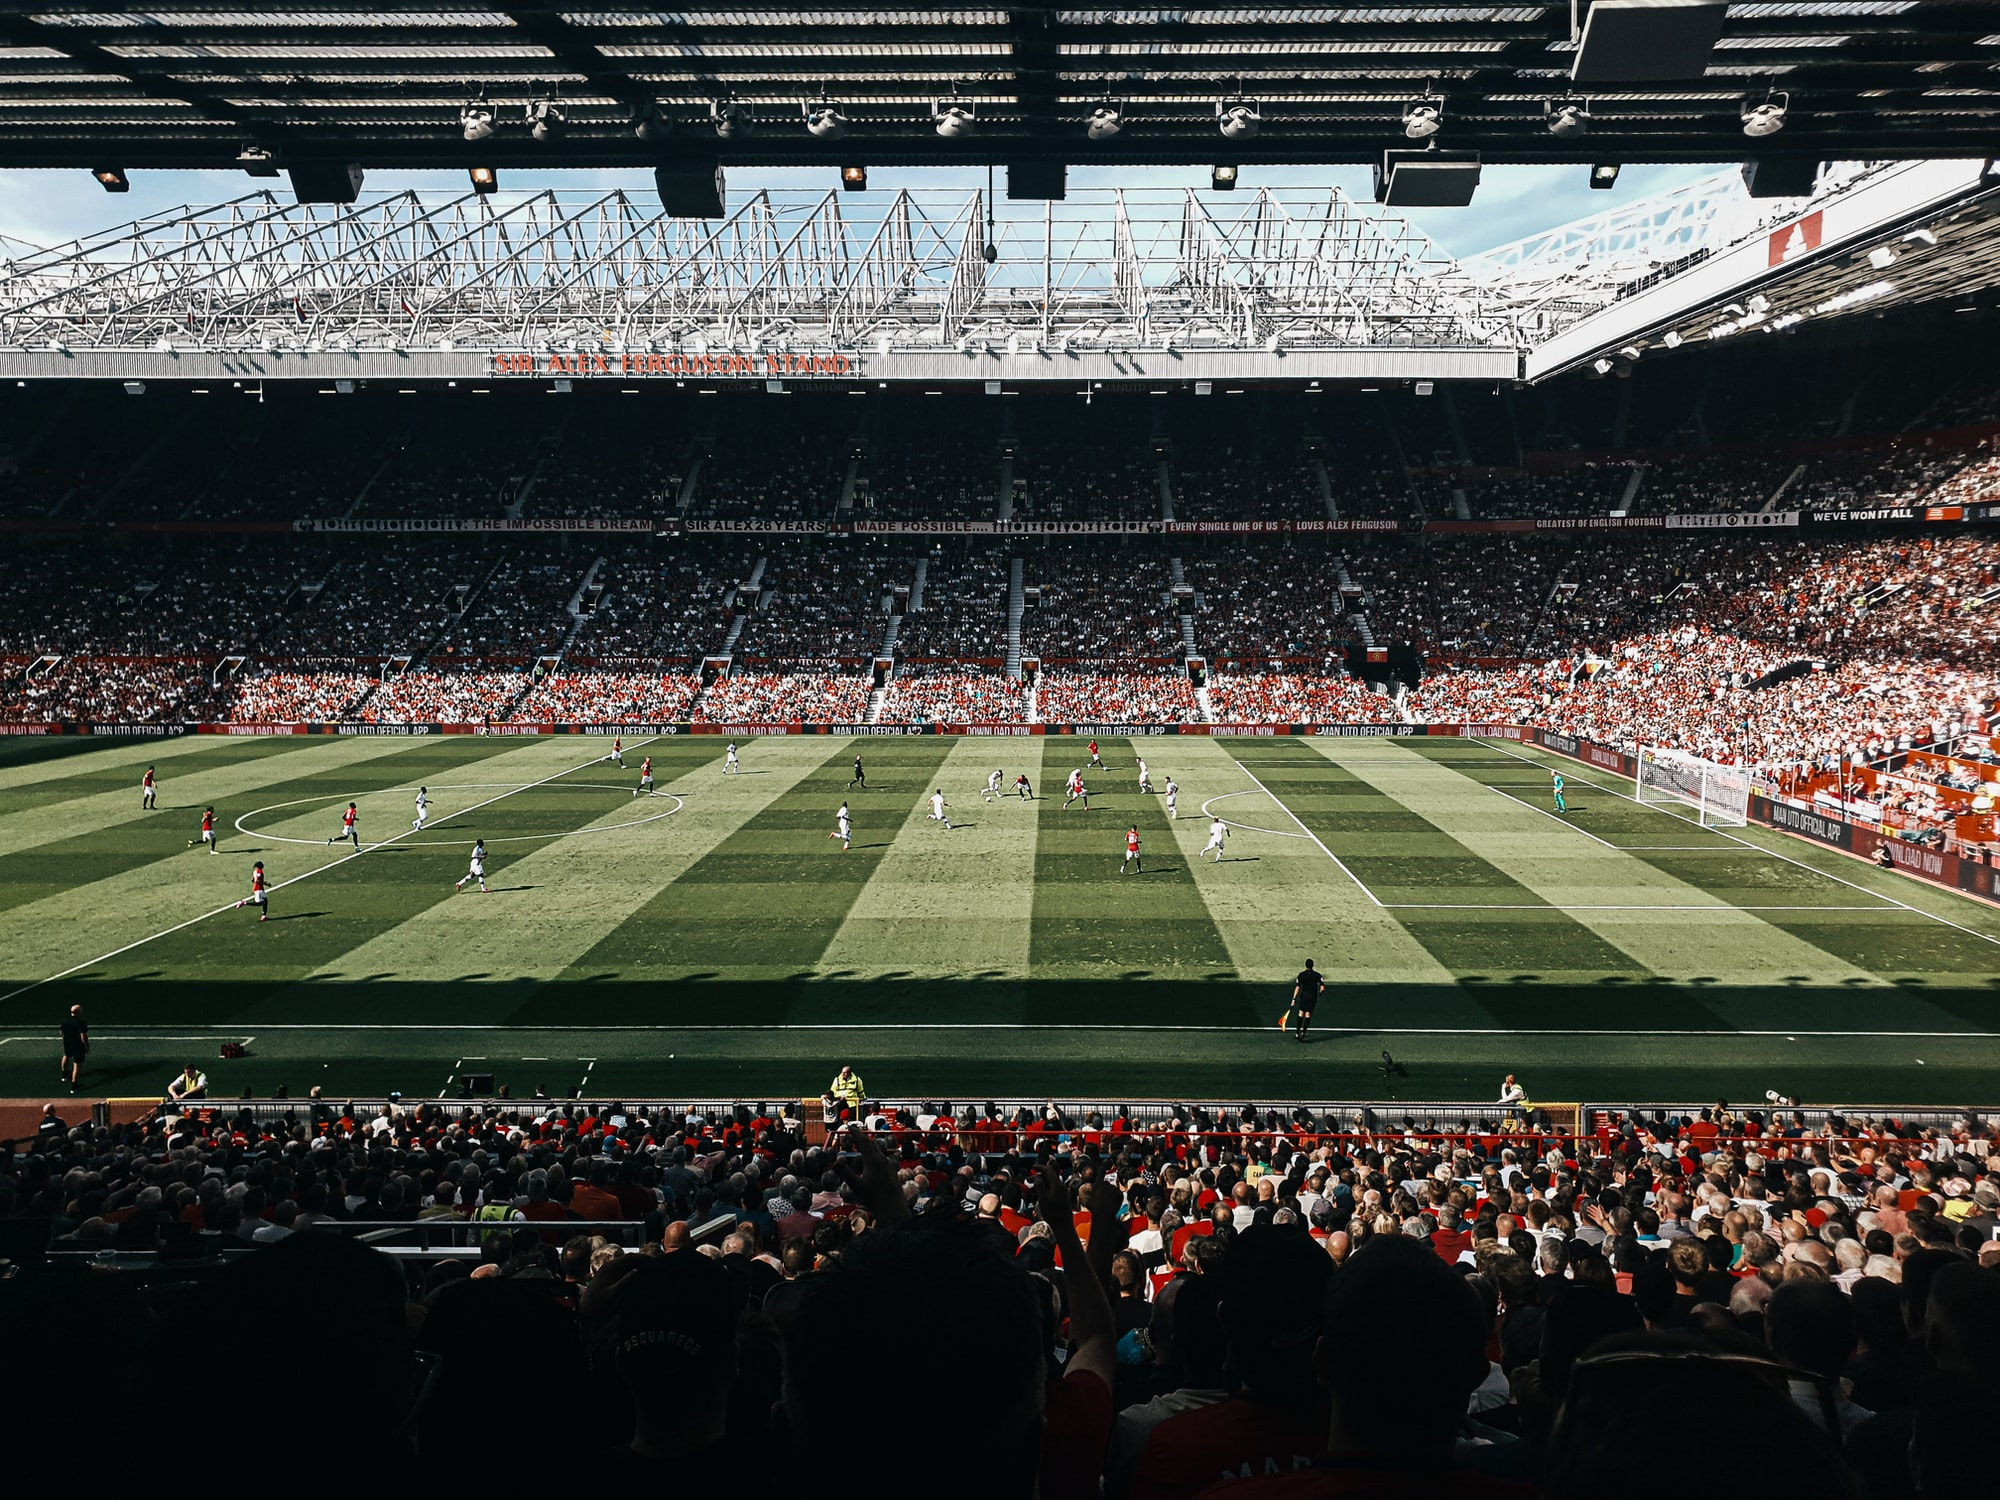 Pronostici Premier League oggi: schedina calcio inglese 27/01/2021